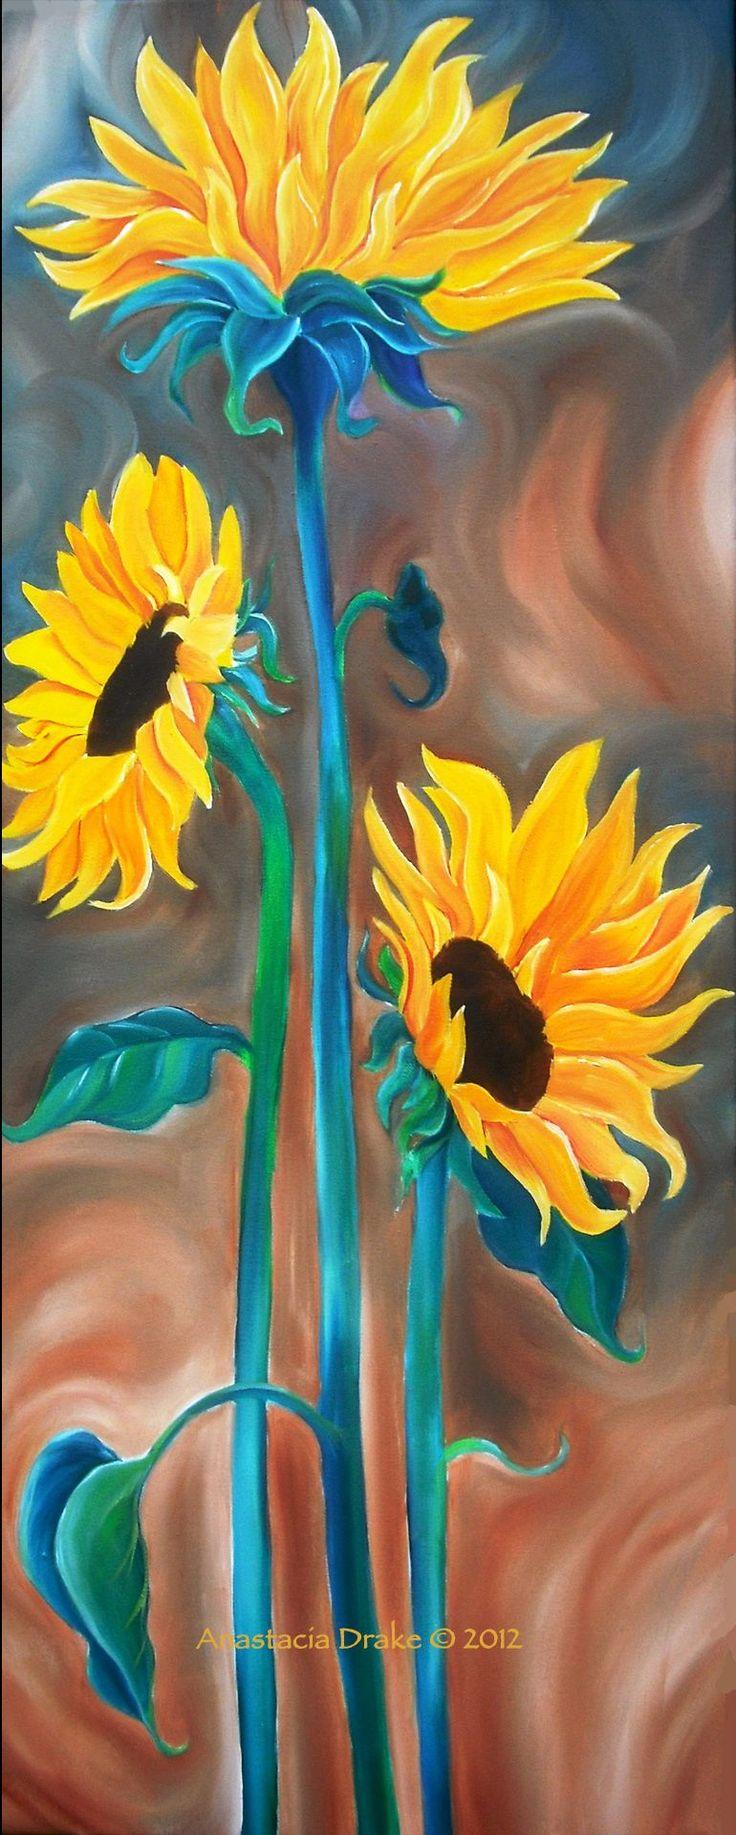 Just the Three of Us, Oil on Canvas #art #painting #strokeofredstudio #OilPaintingOnCanvas